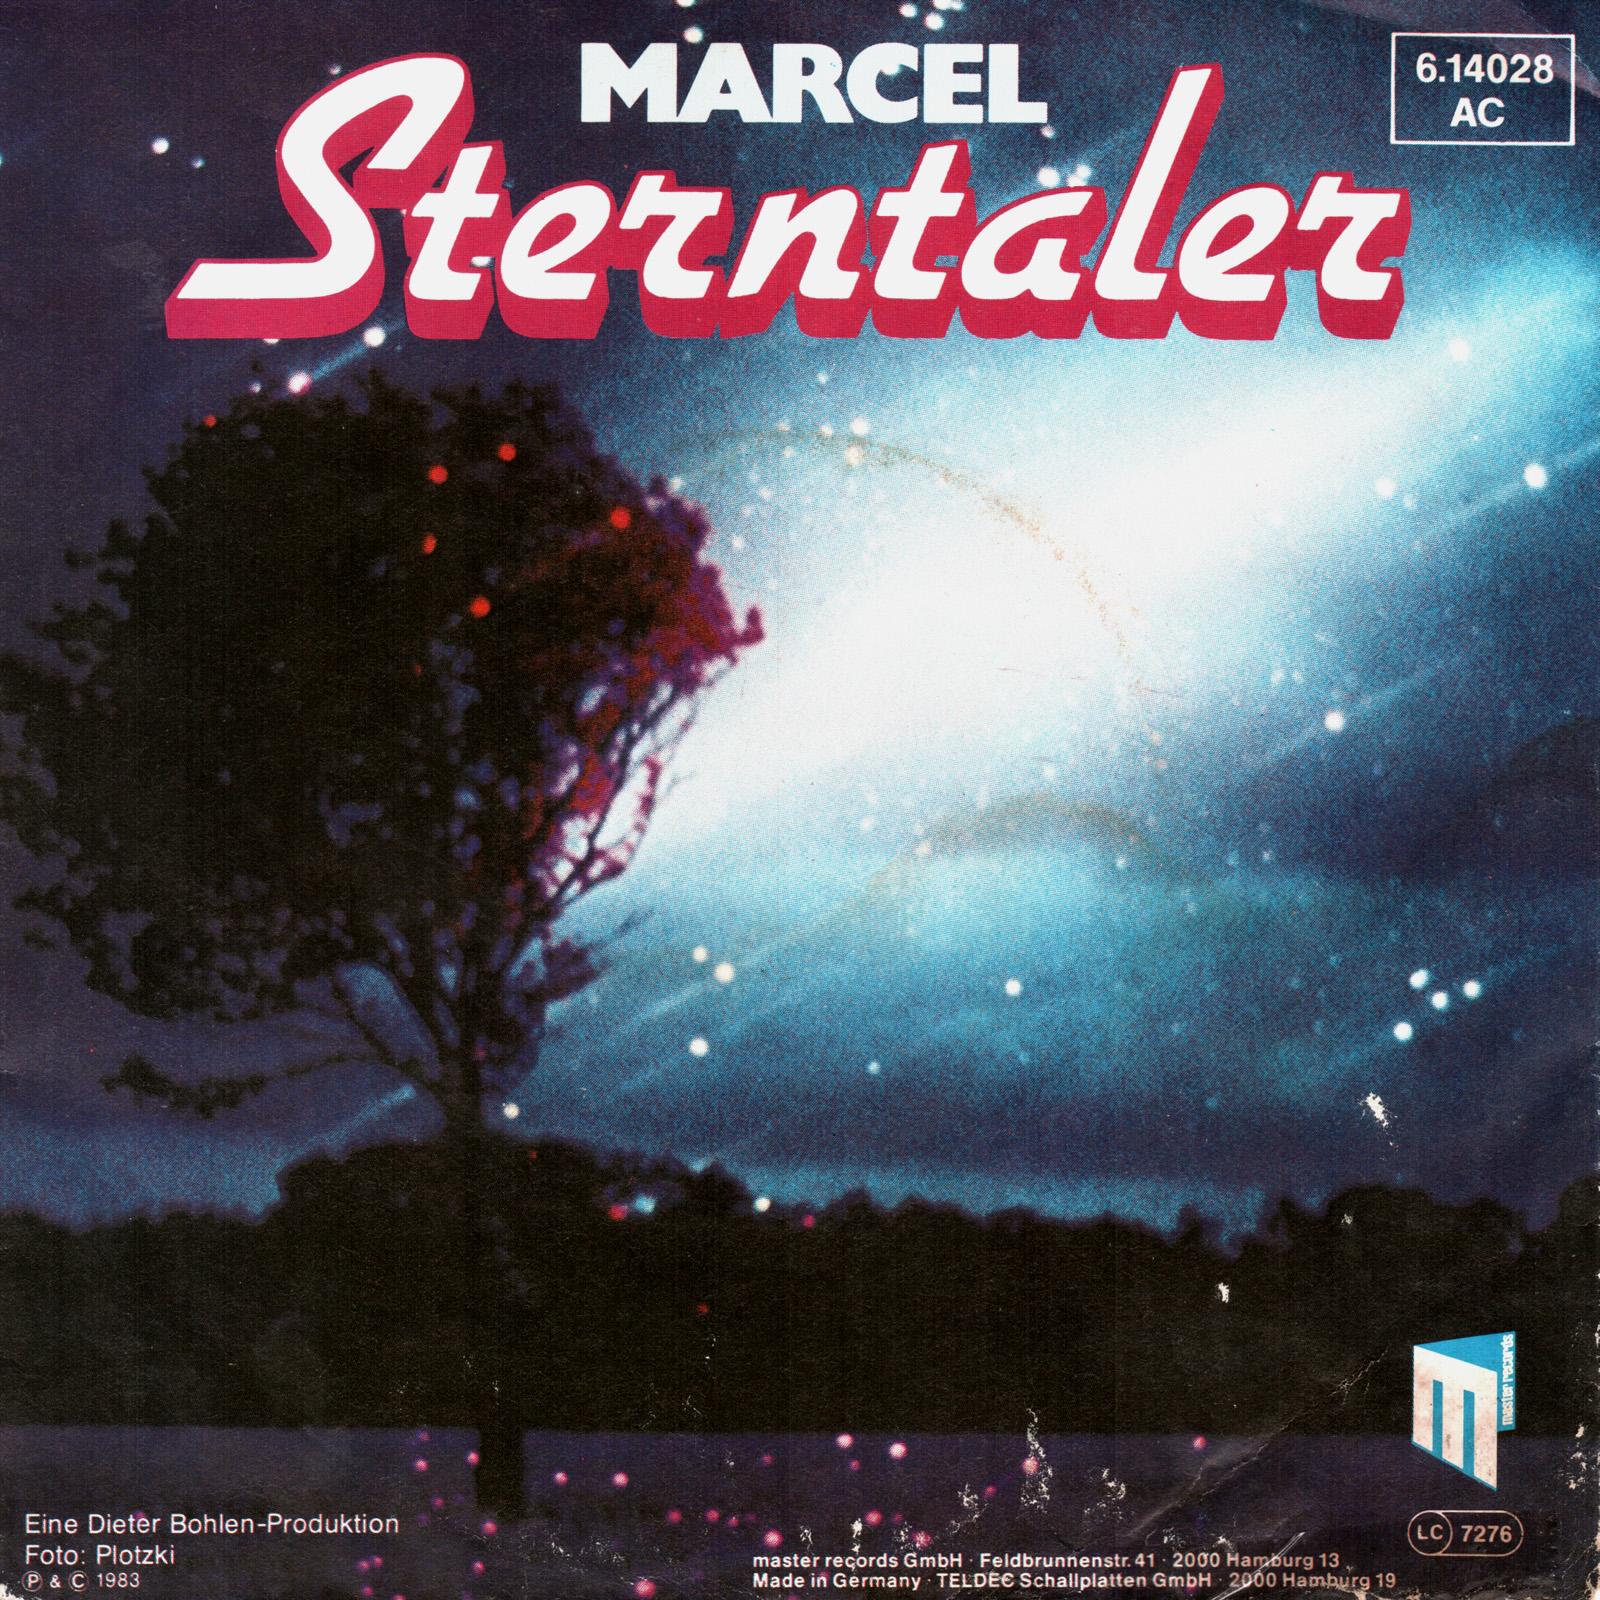 Marcel - Sterntaler (Vinyl,7'') (1983)